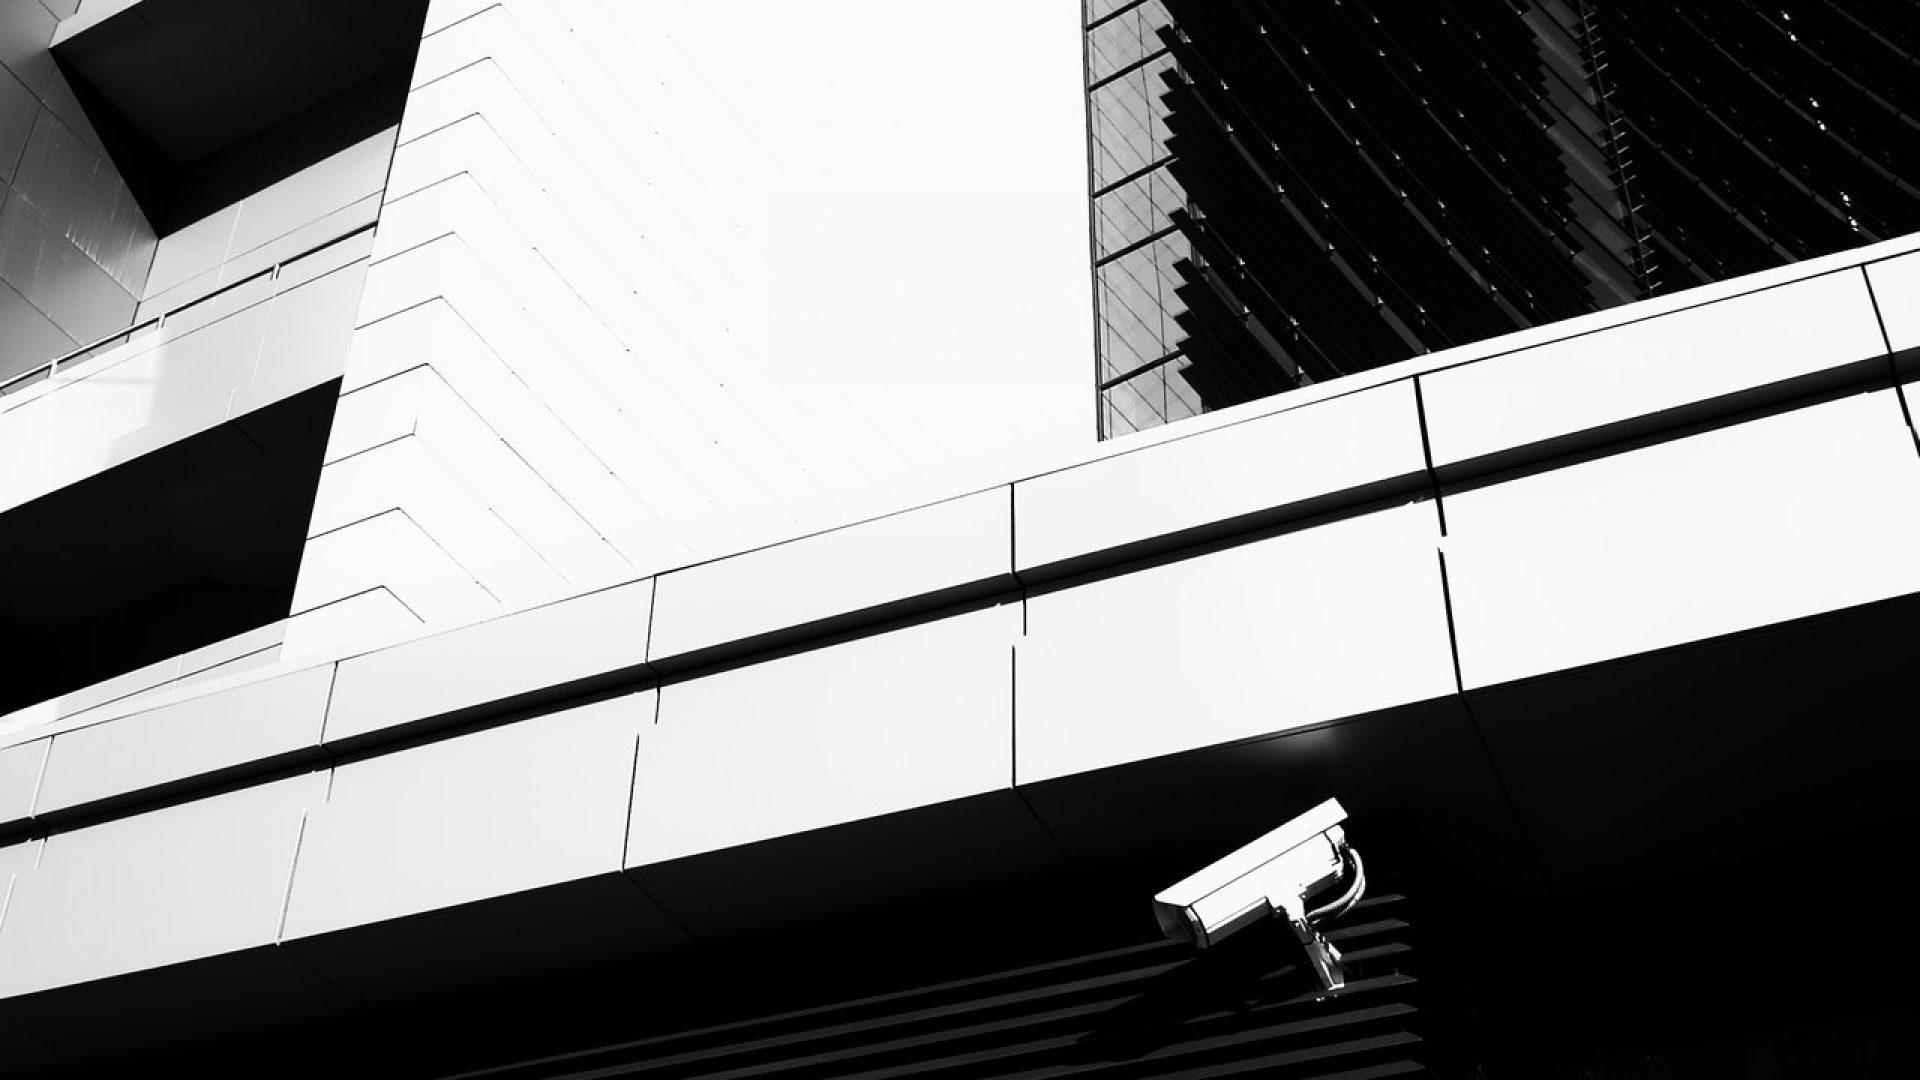 Cctv Camera in Wall